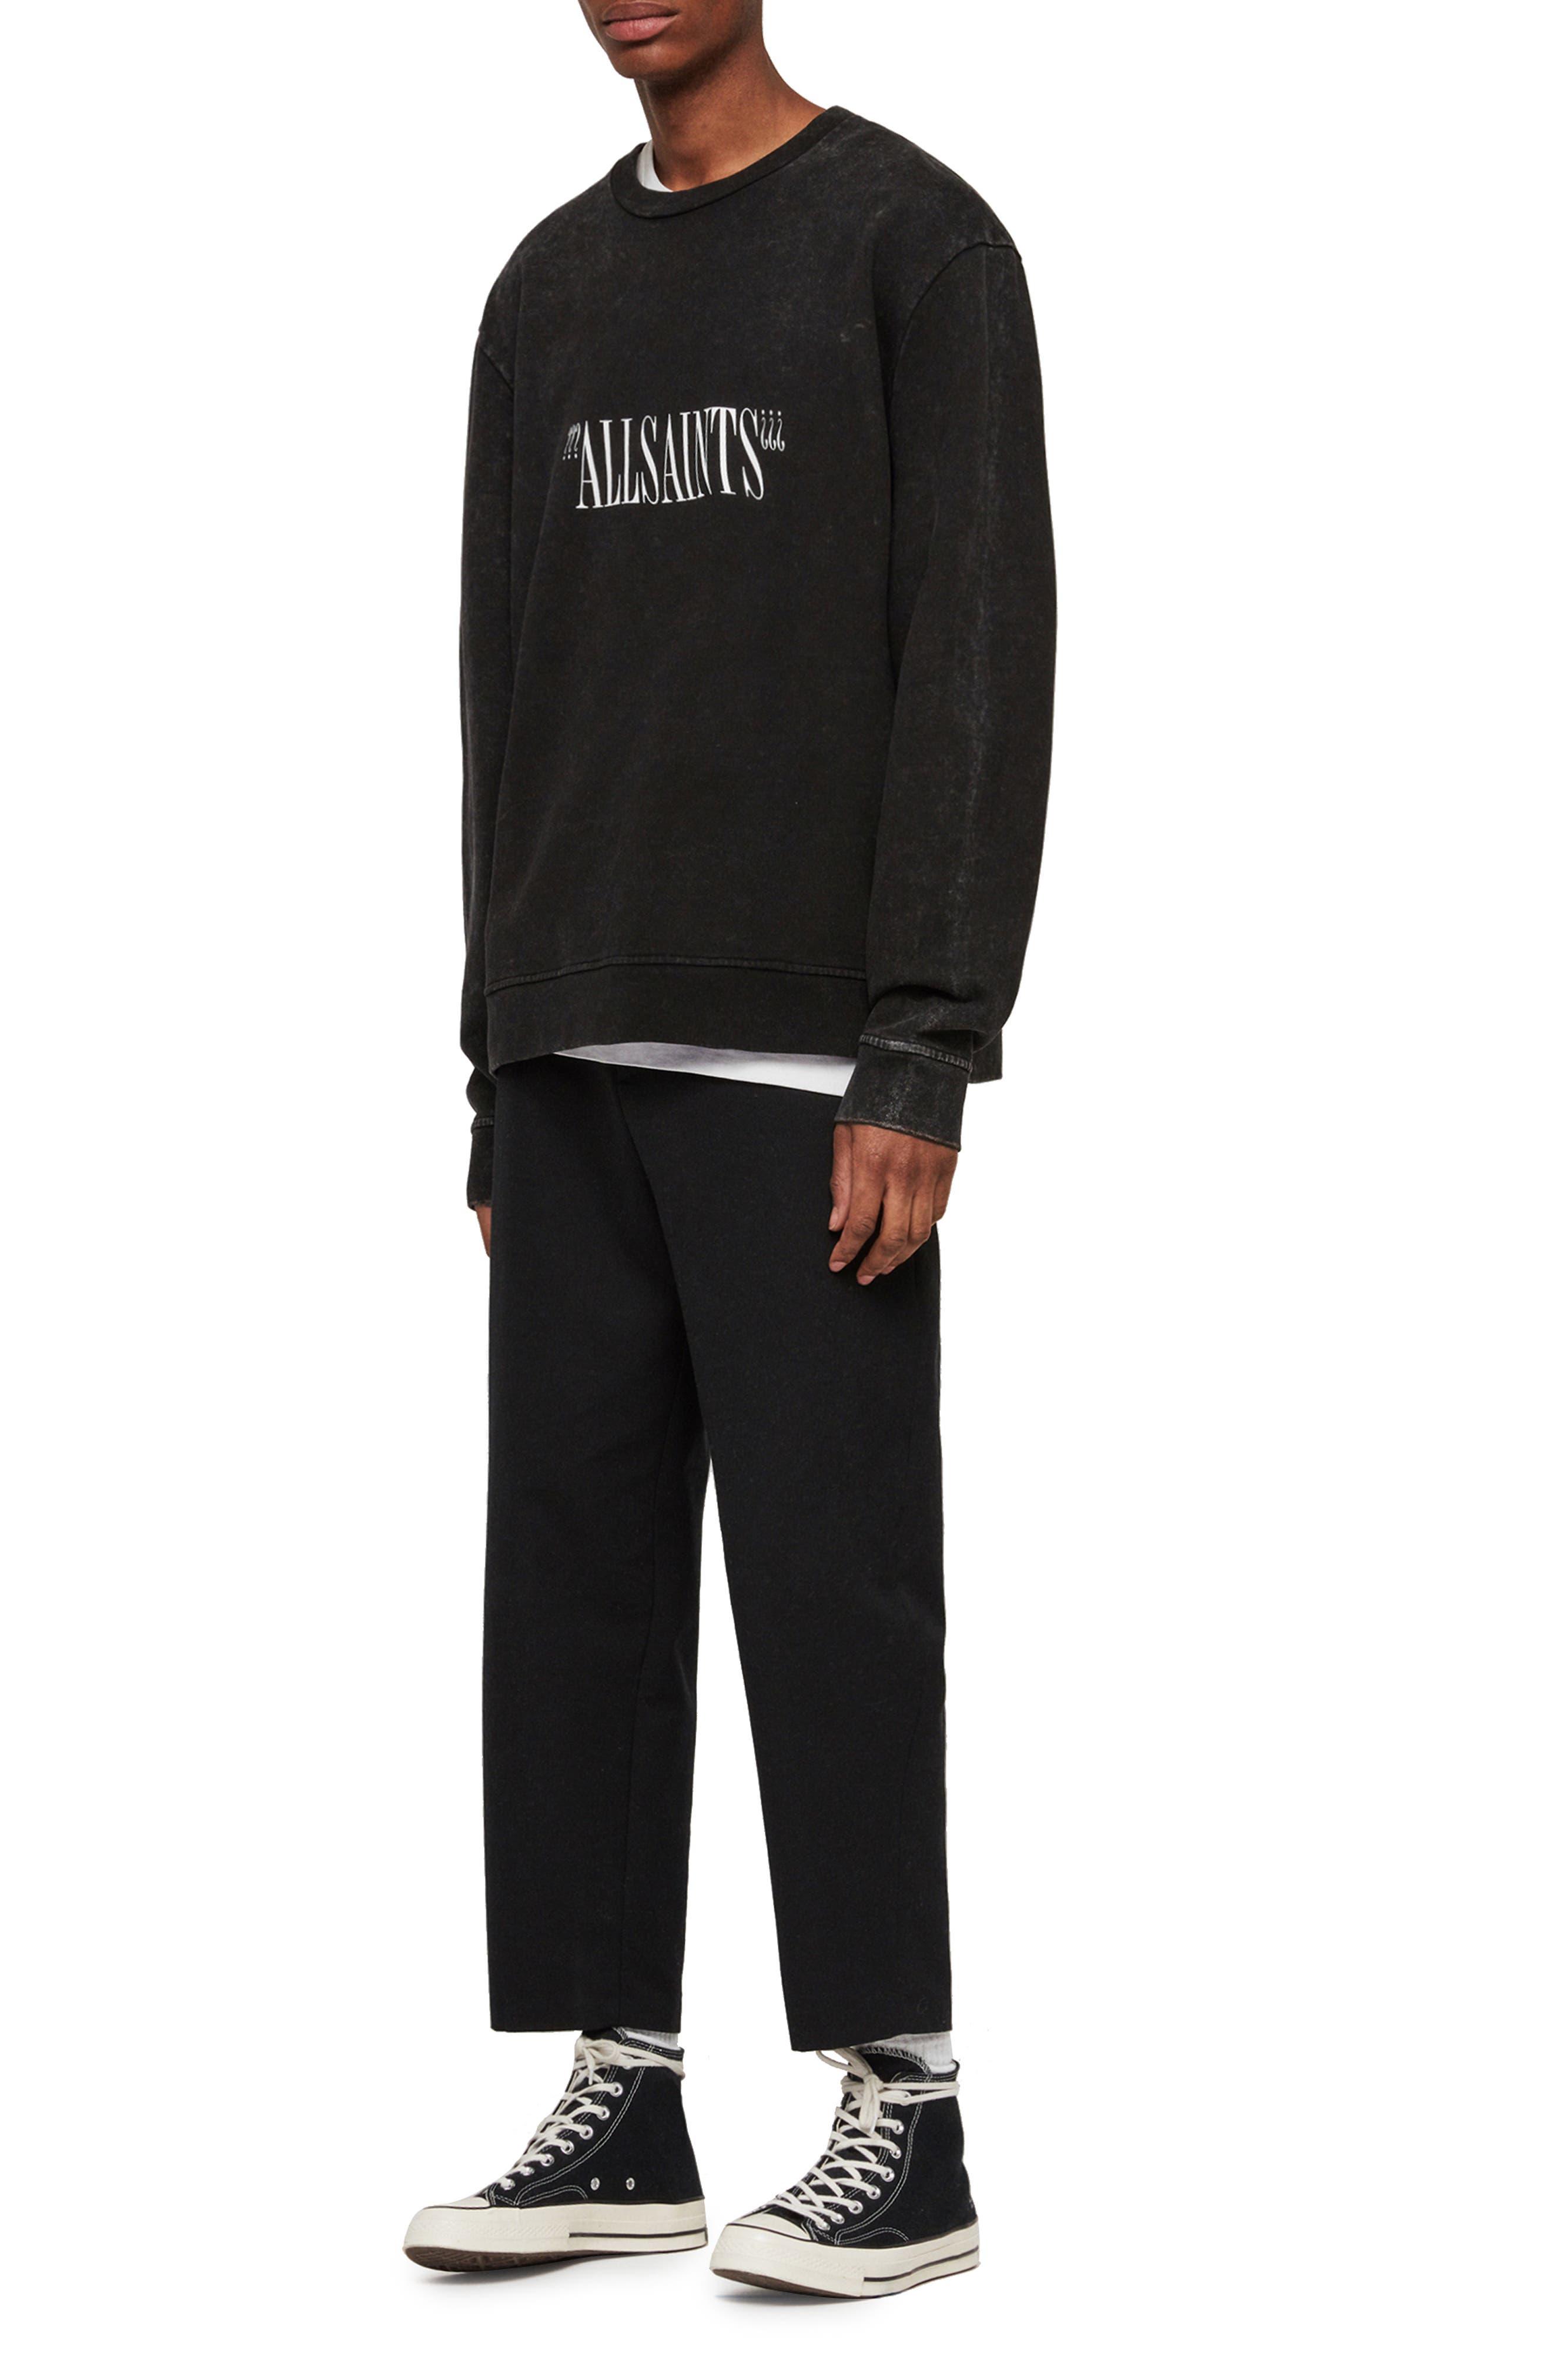 ALLSAINTS, Brackets Logo Graphic Fleece Sweatshirt, Alternate thumbnail 4, color, ACID WASHED BLACK